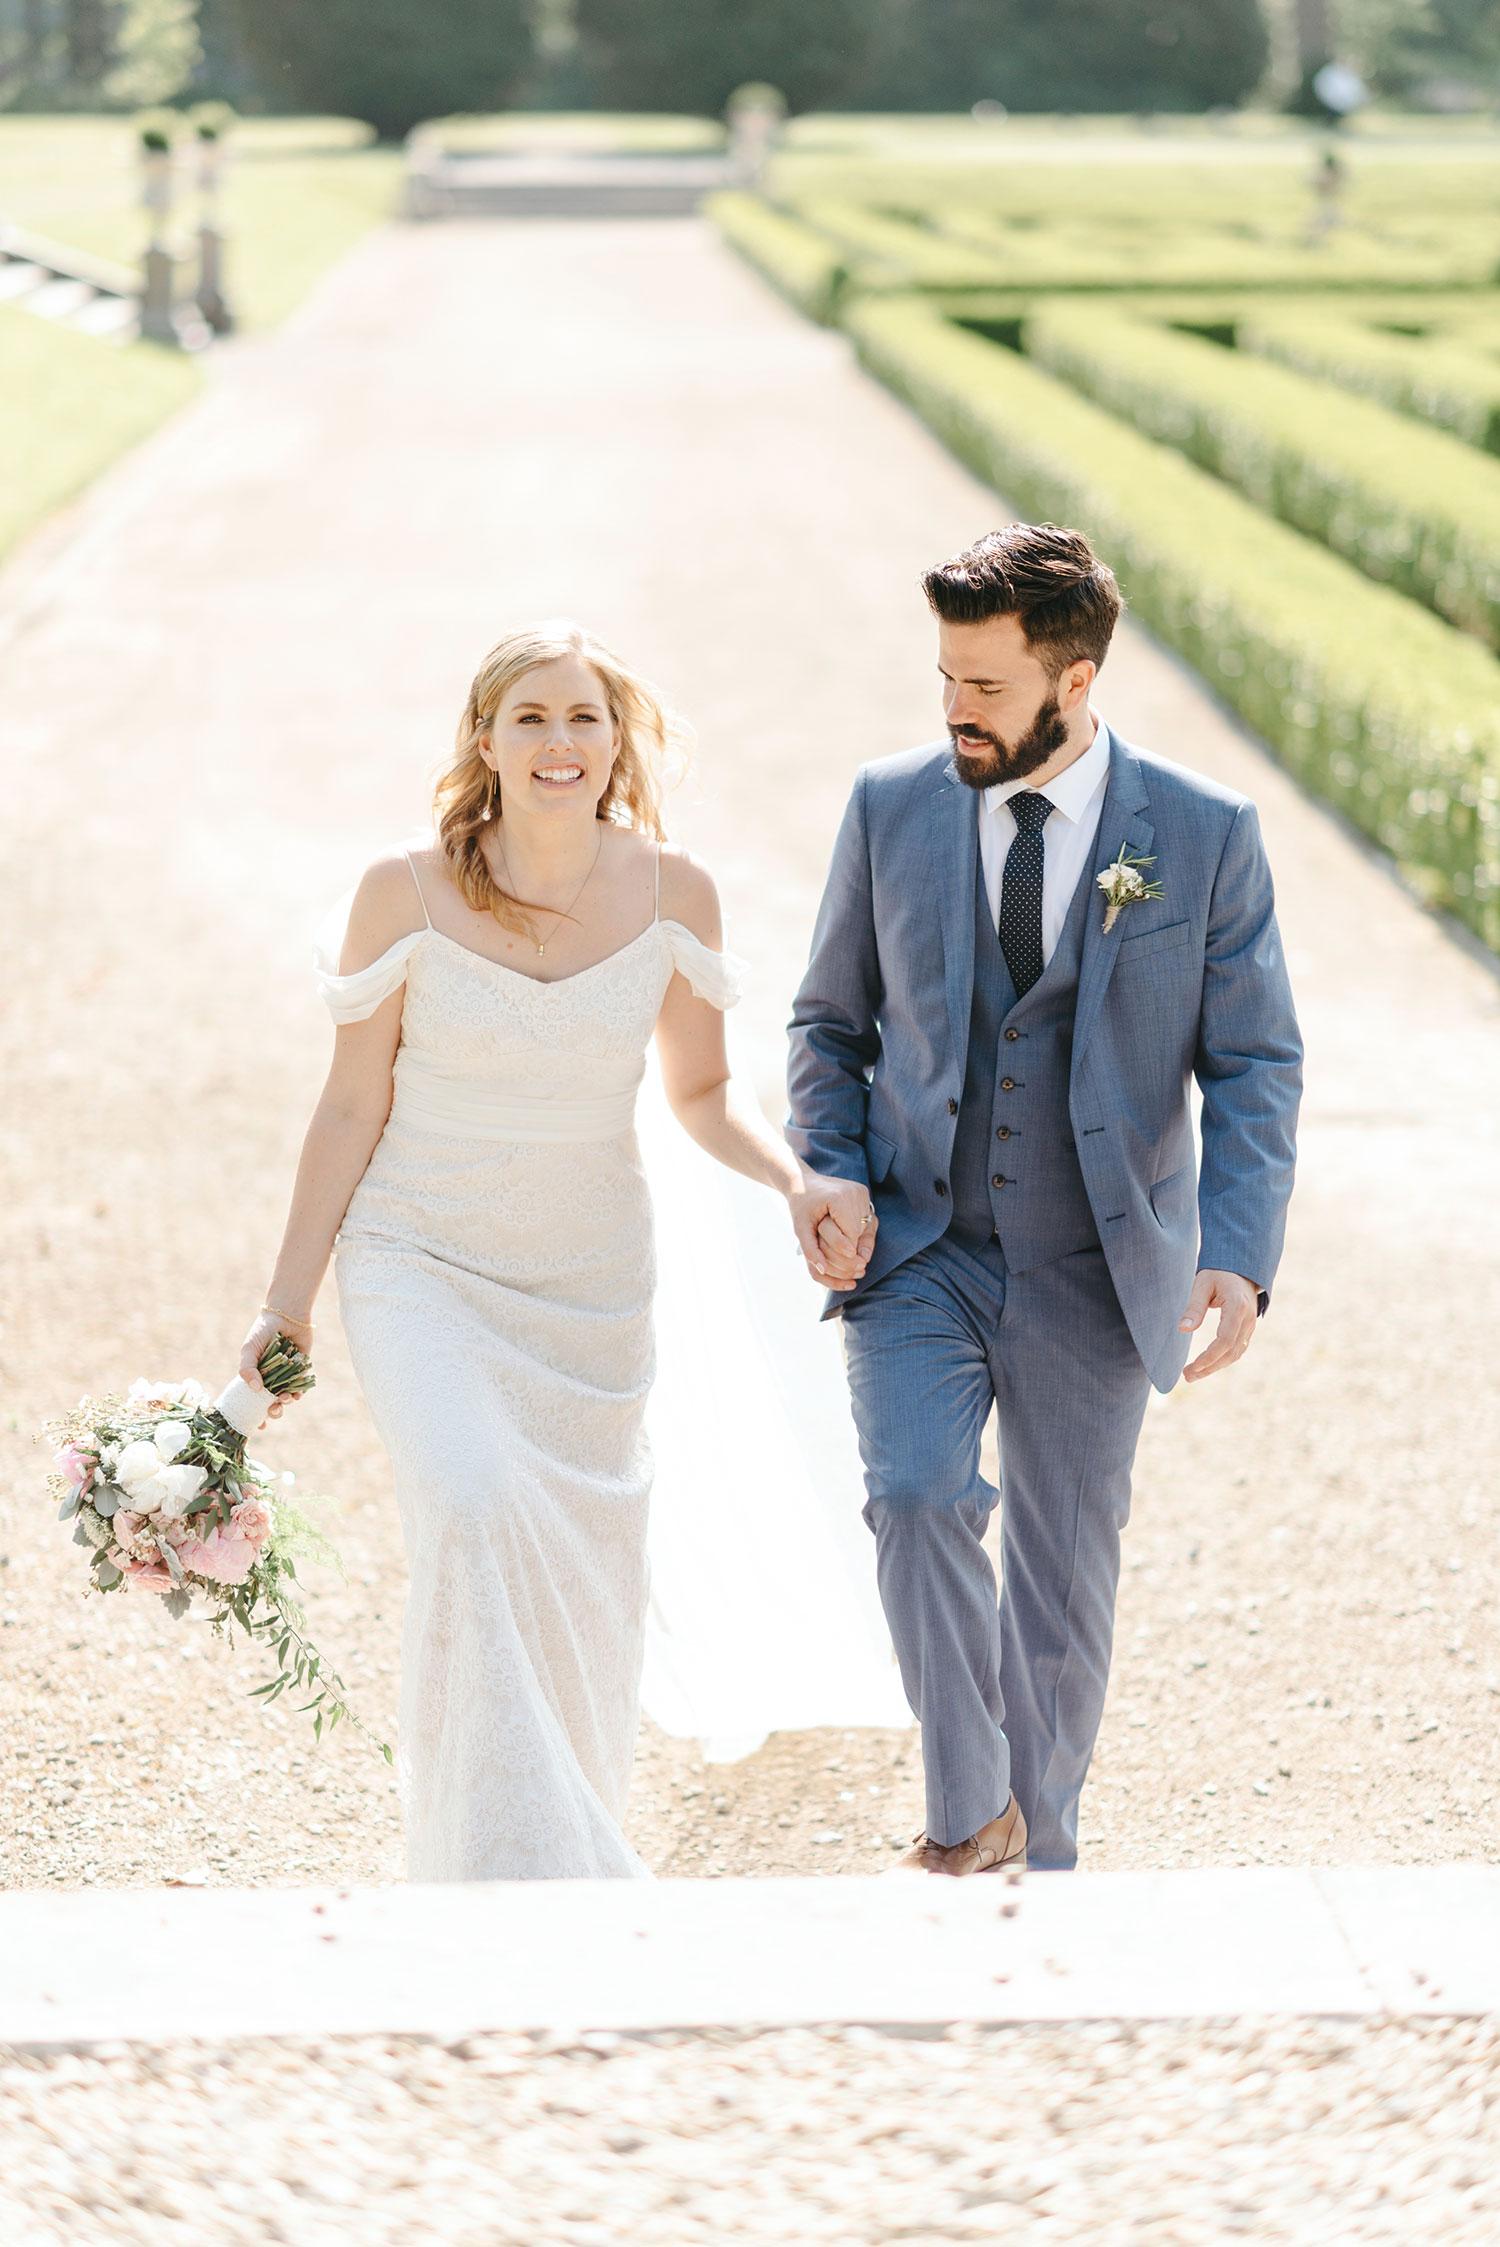 castlemartyr-wedding-photography-0077_0448.jpg